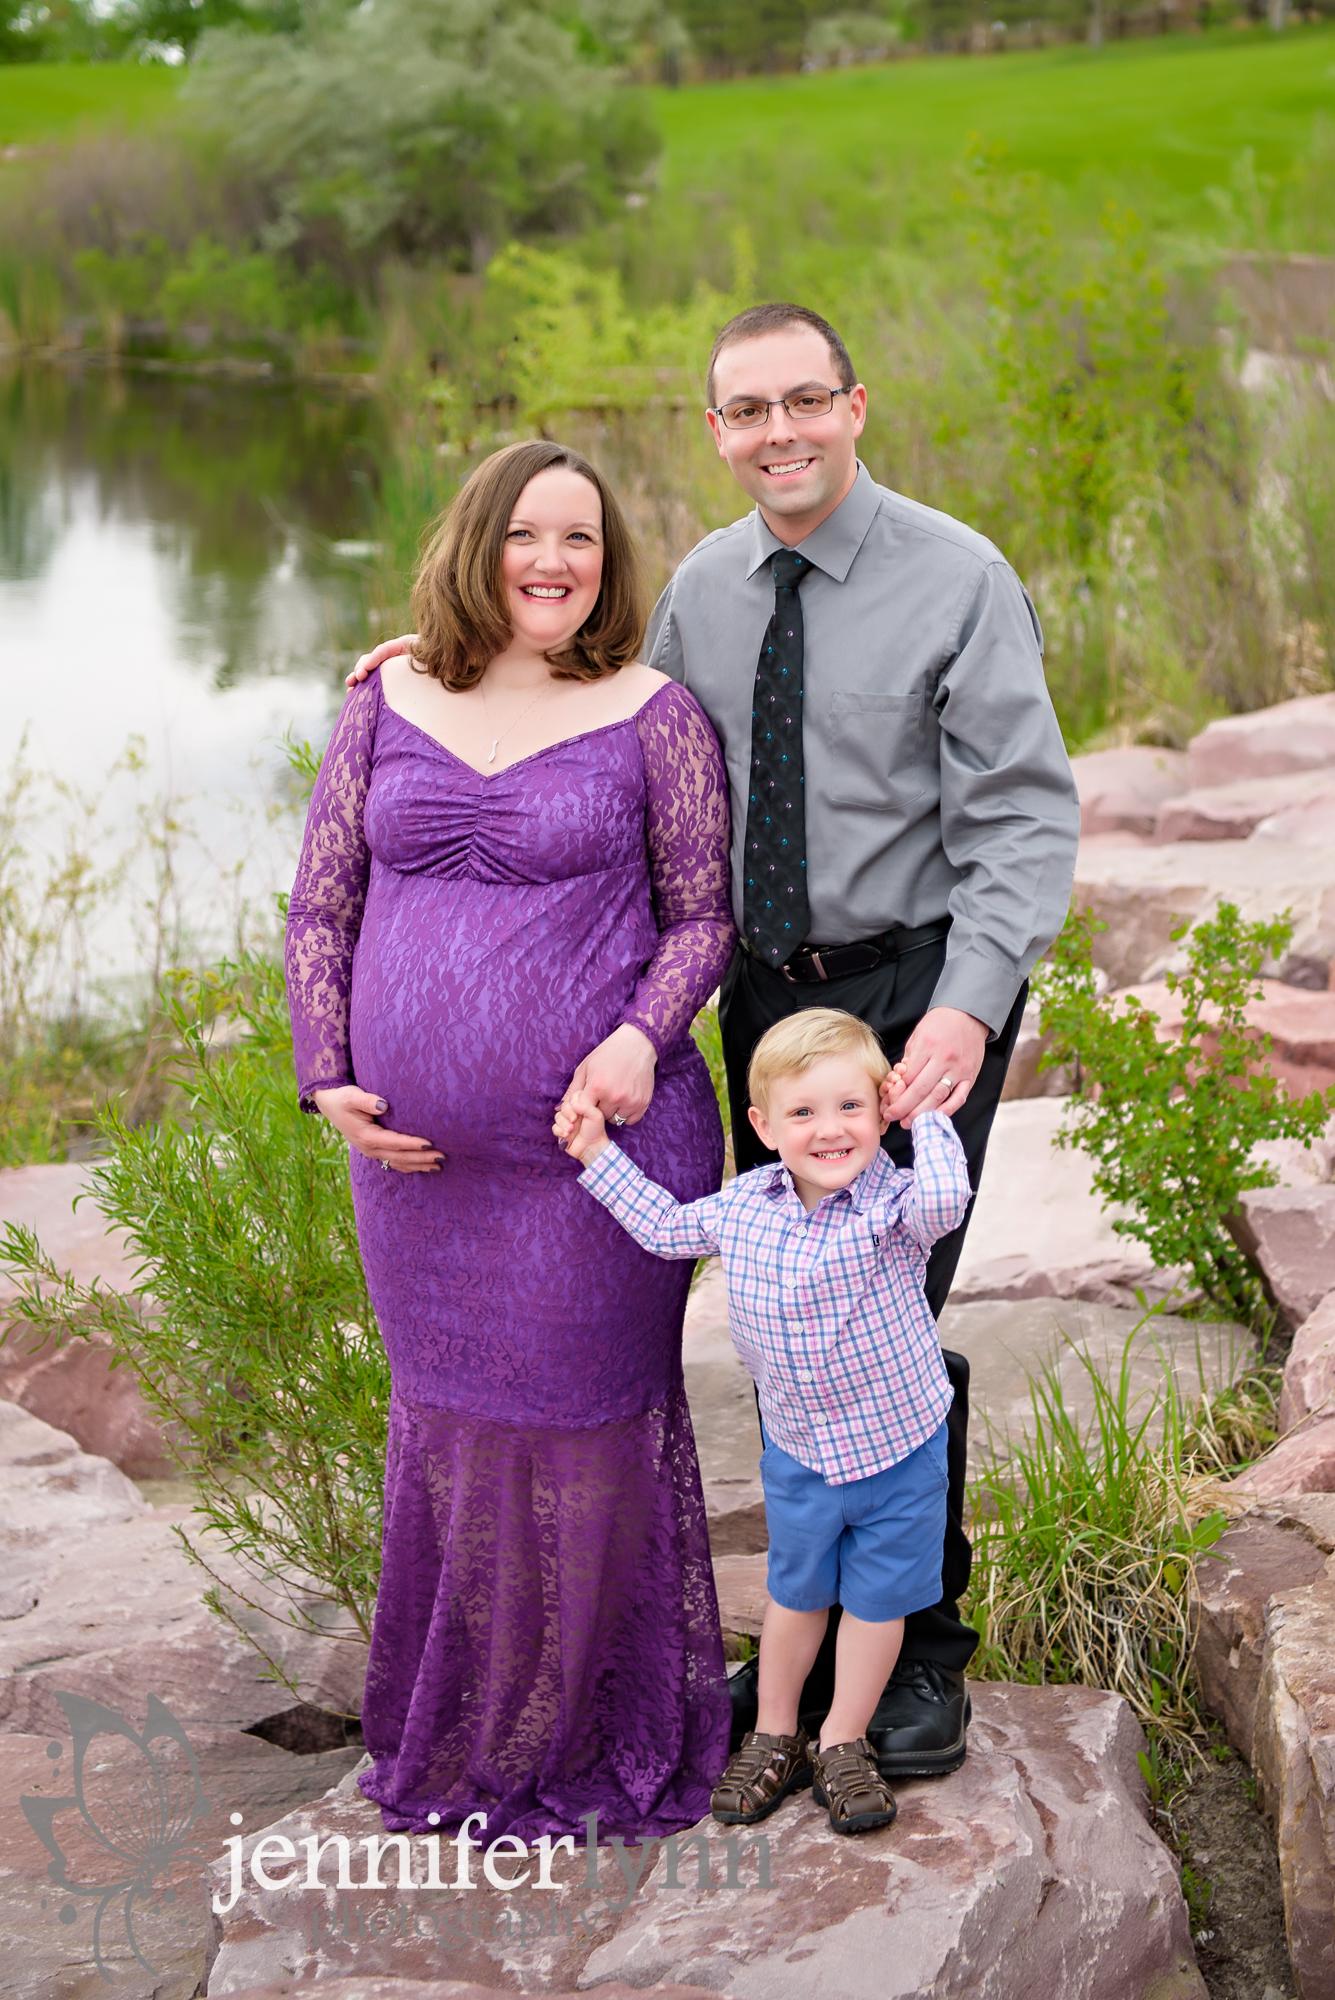 Maternity Session Family Photo